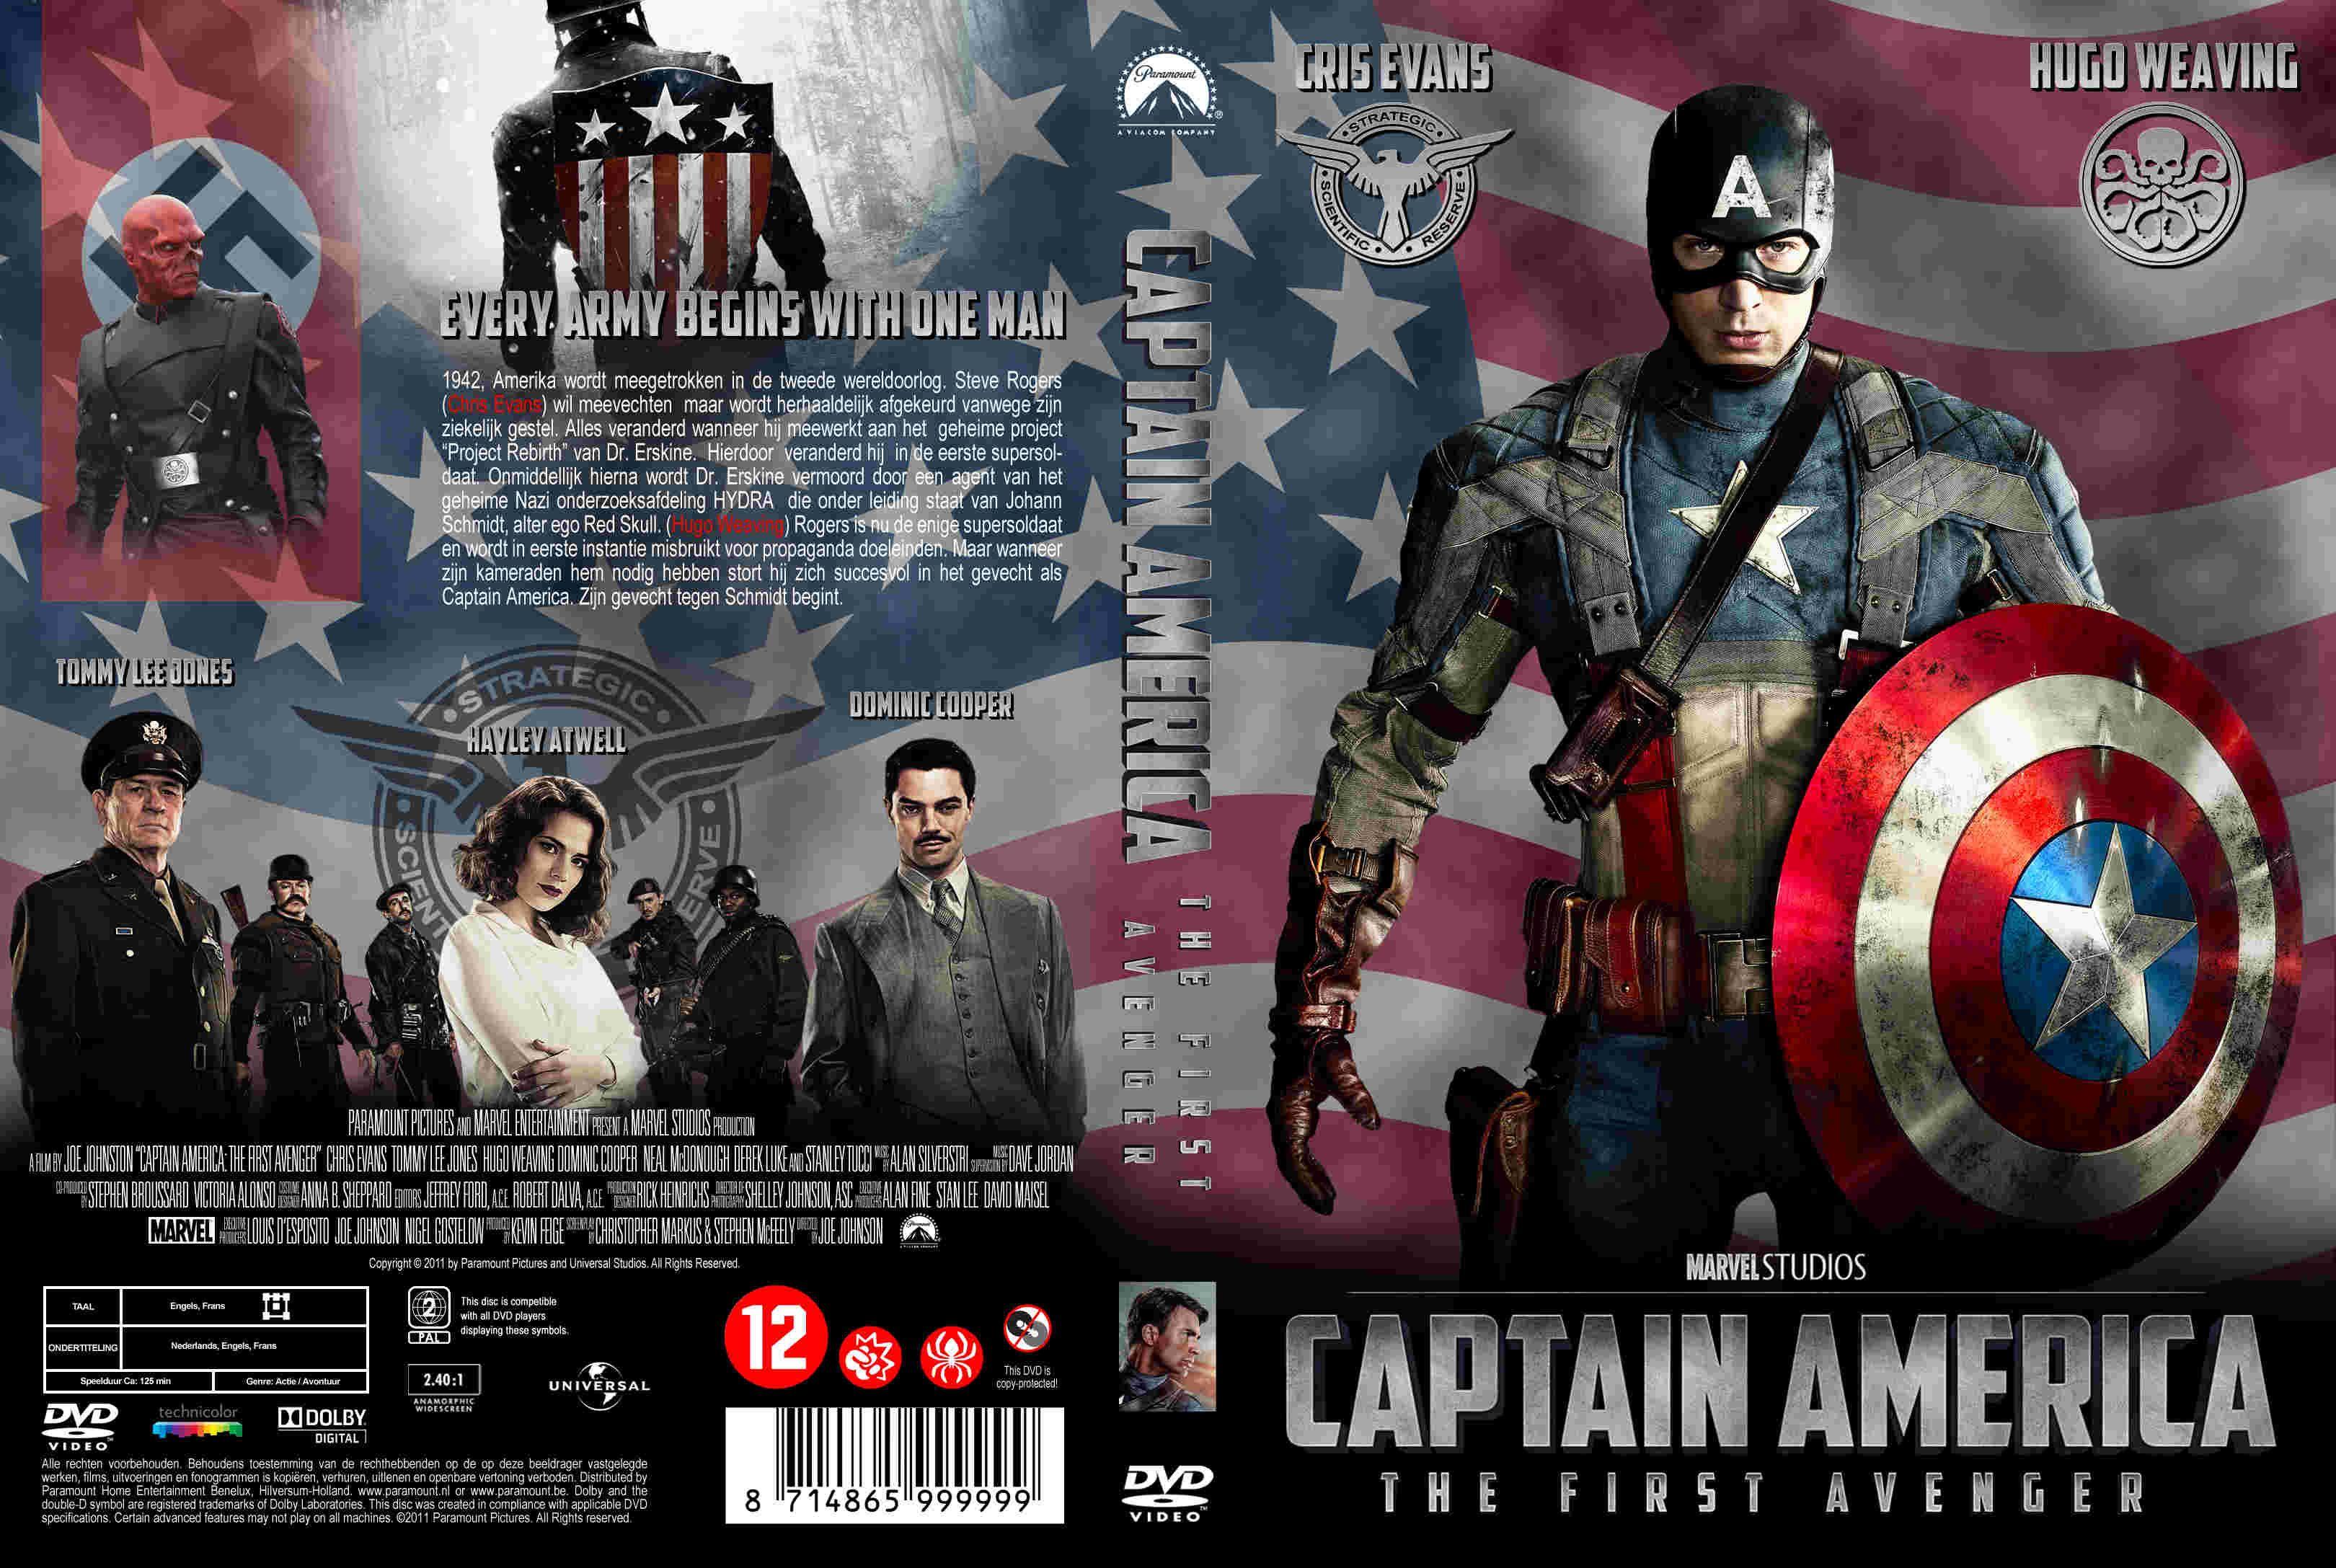 Capitan America El Primer Vengador 2011 Captain America Poster Marvel Movie Posters Marvel Posters